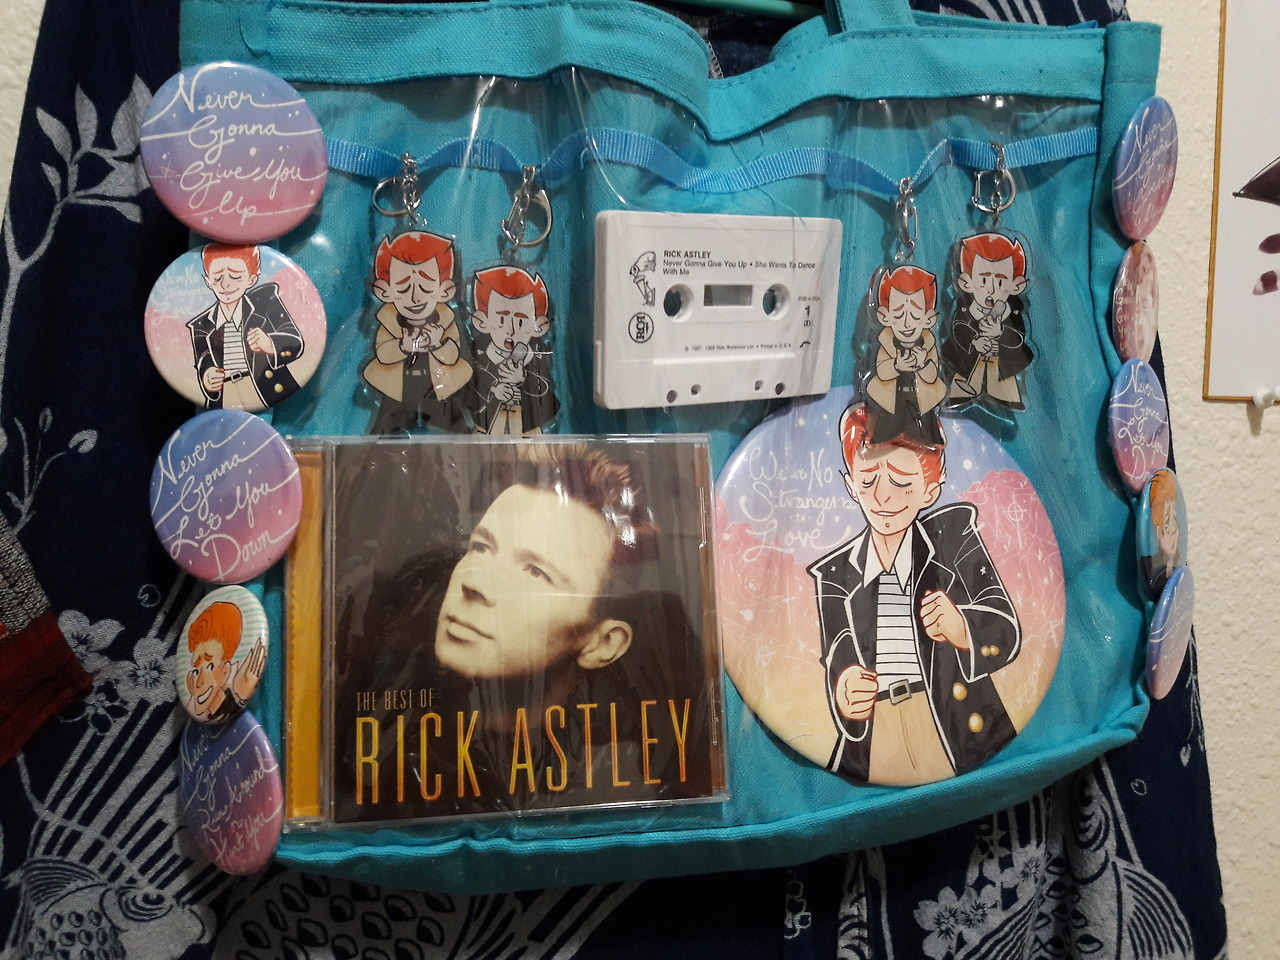 Rick Astley Fan Art Buttons